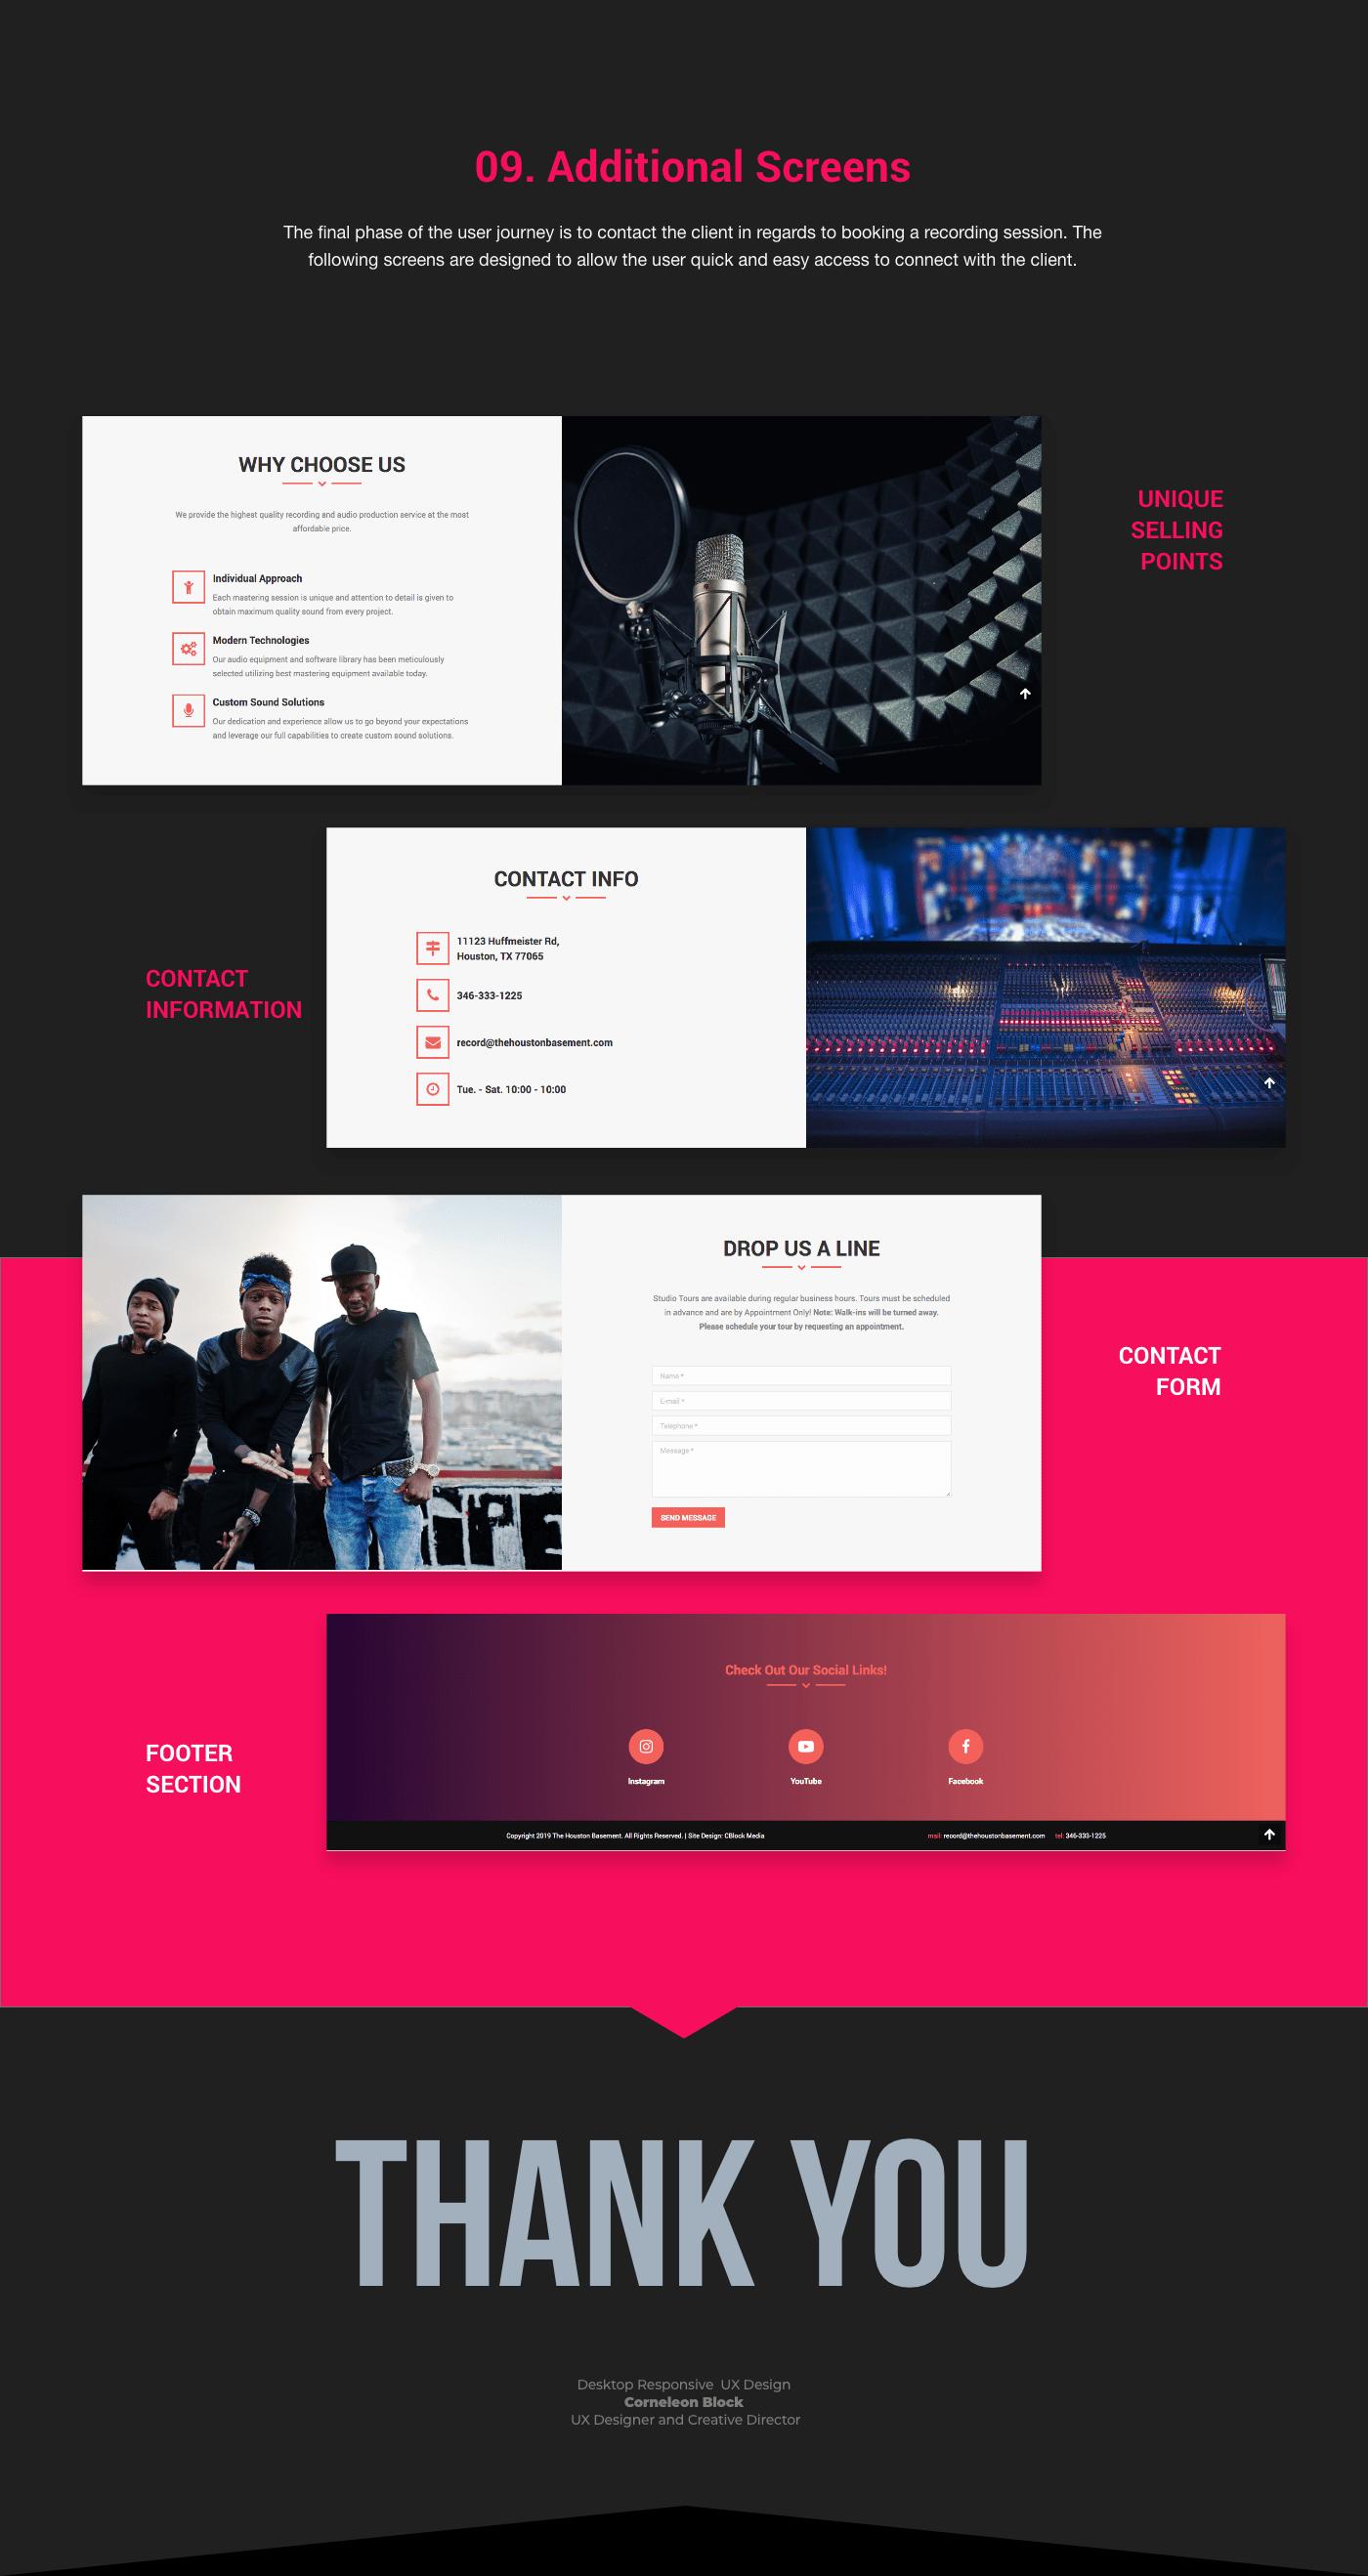 Adobe XD ux music cblockmedia Corneleon Block Houston Texas media player Single Page UX process Website